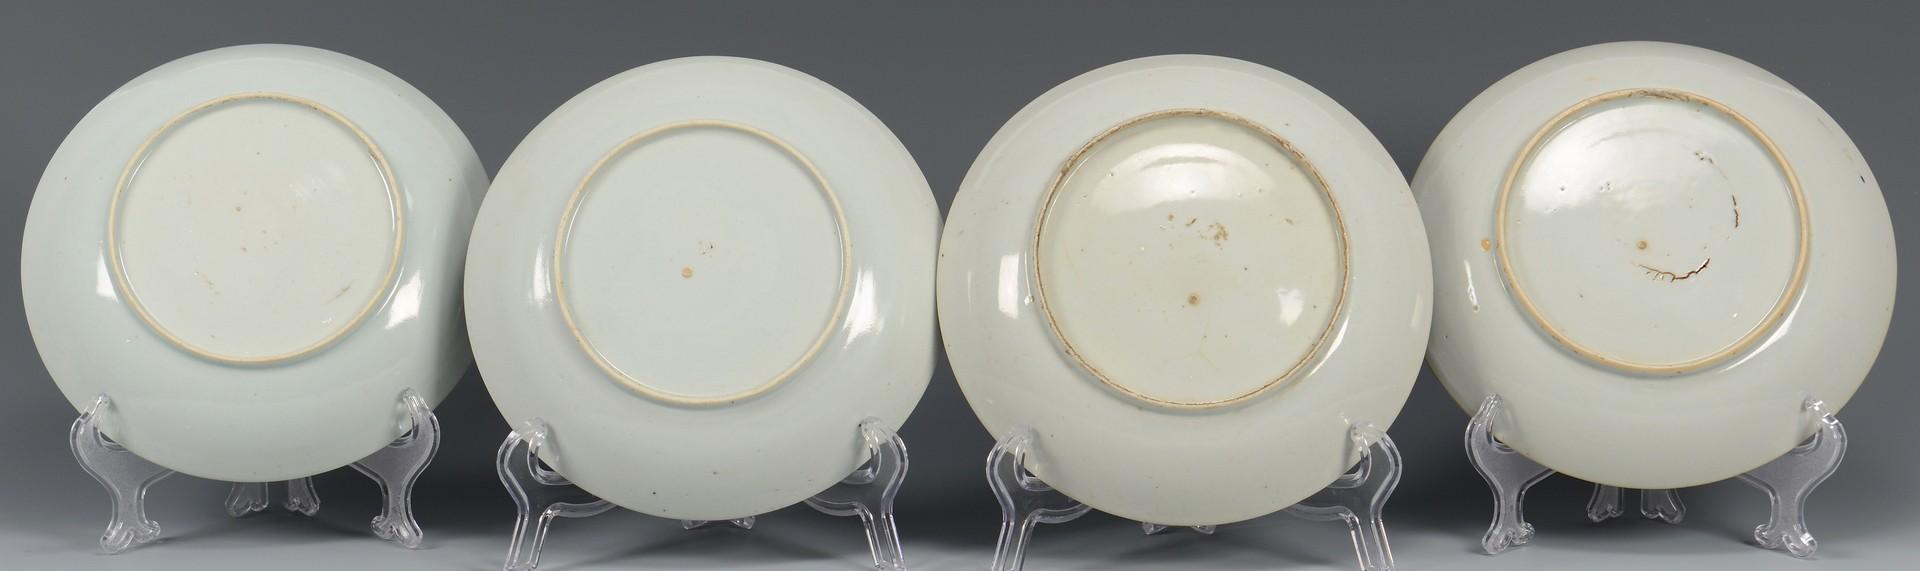 Lot 350: 12 Porcelain Asian Export Items